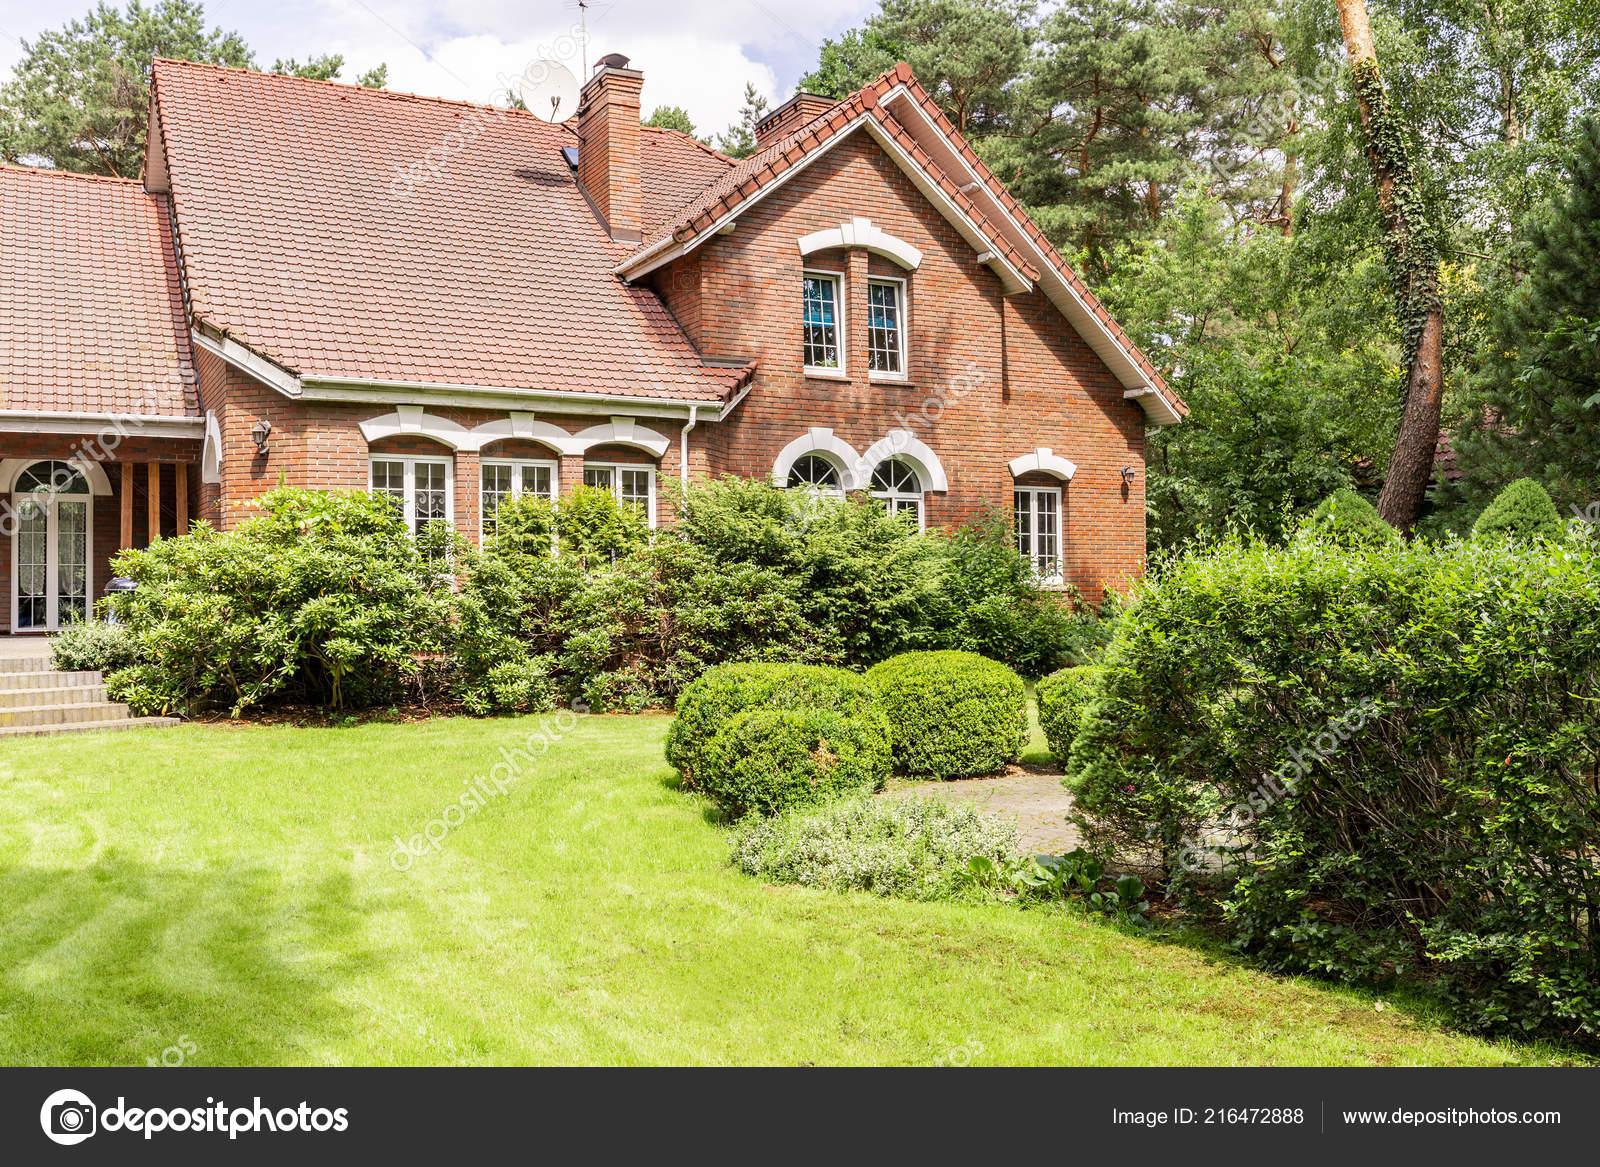 Real P O Garden Bushes Beautiful Brick House Stock P O